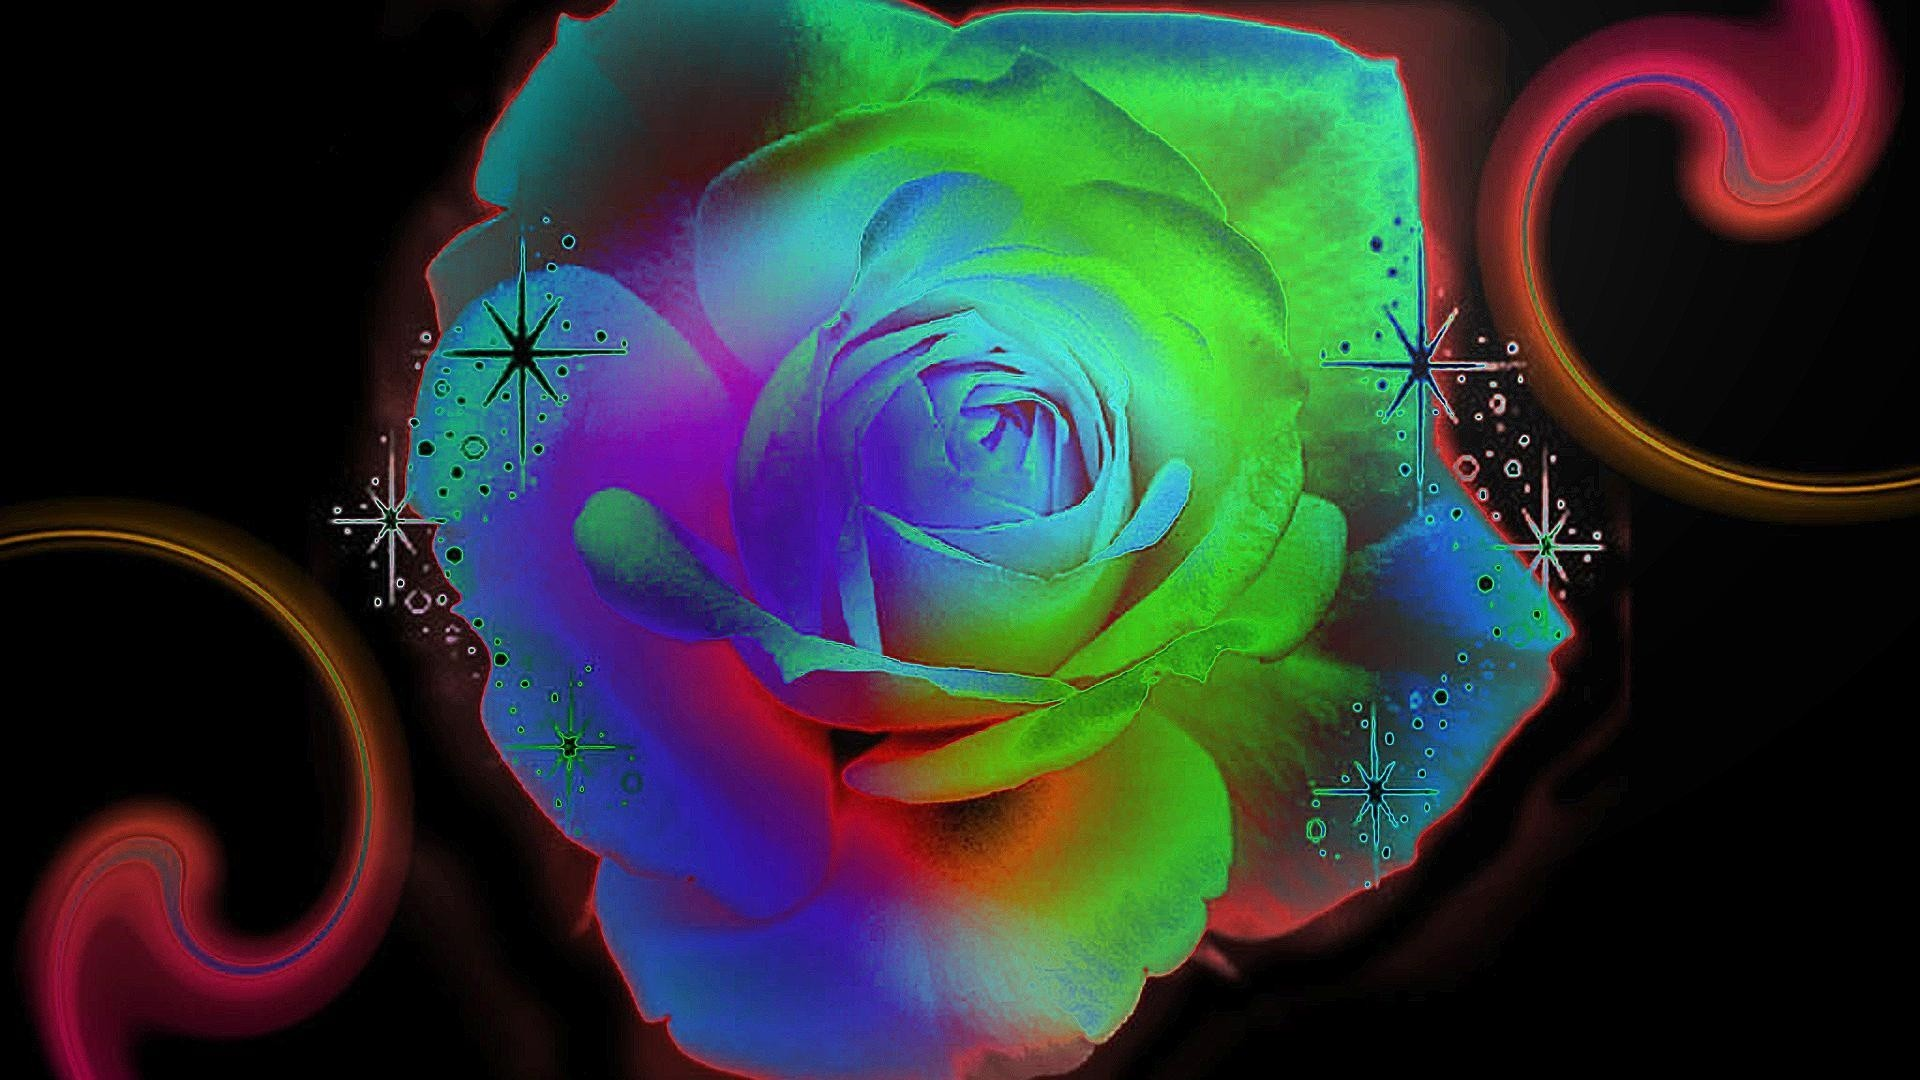 Bright roses roses) via www.